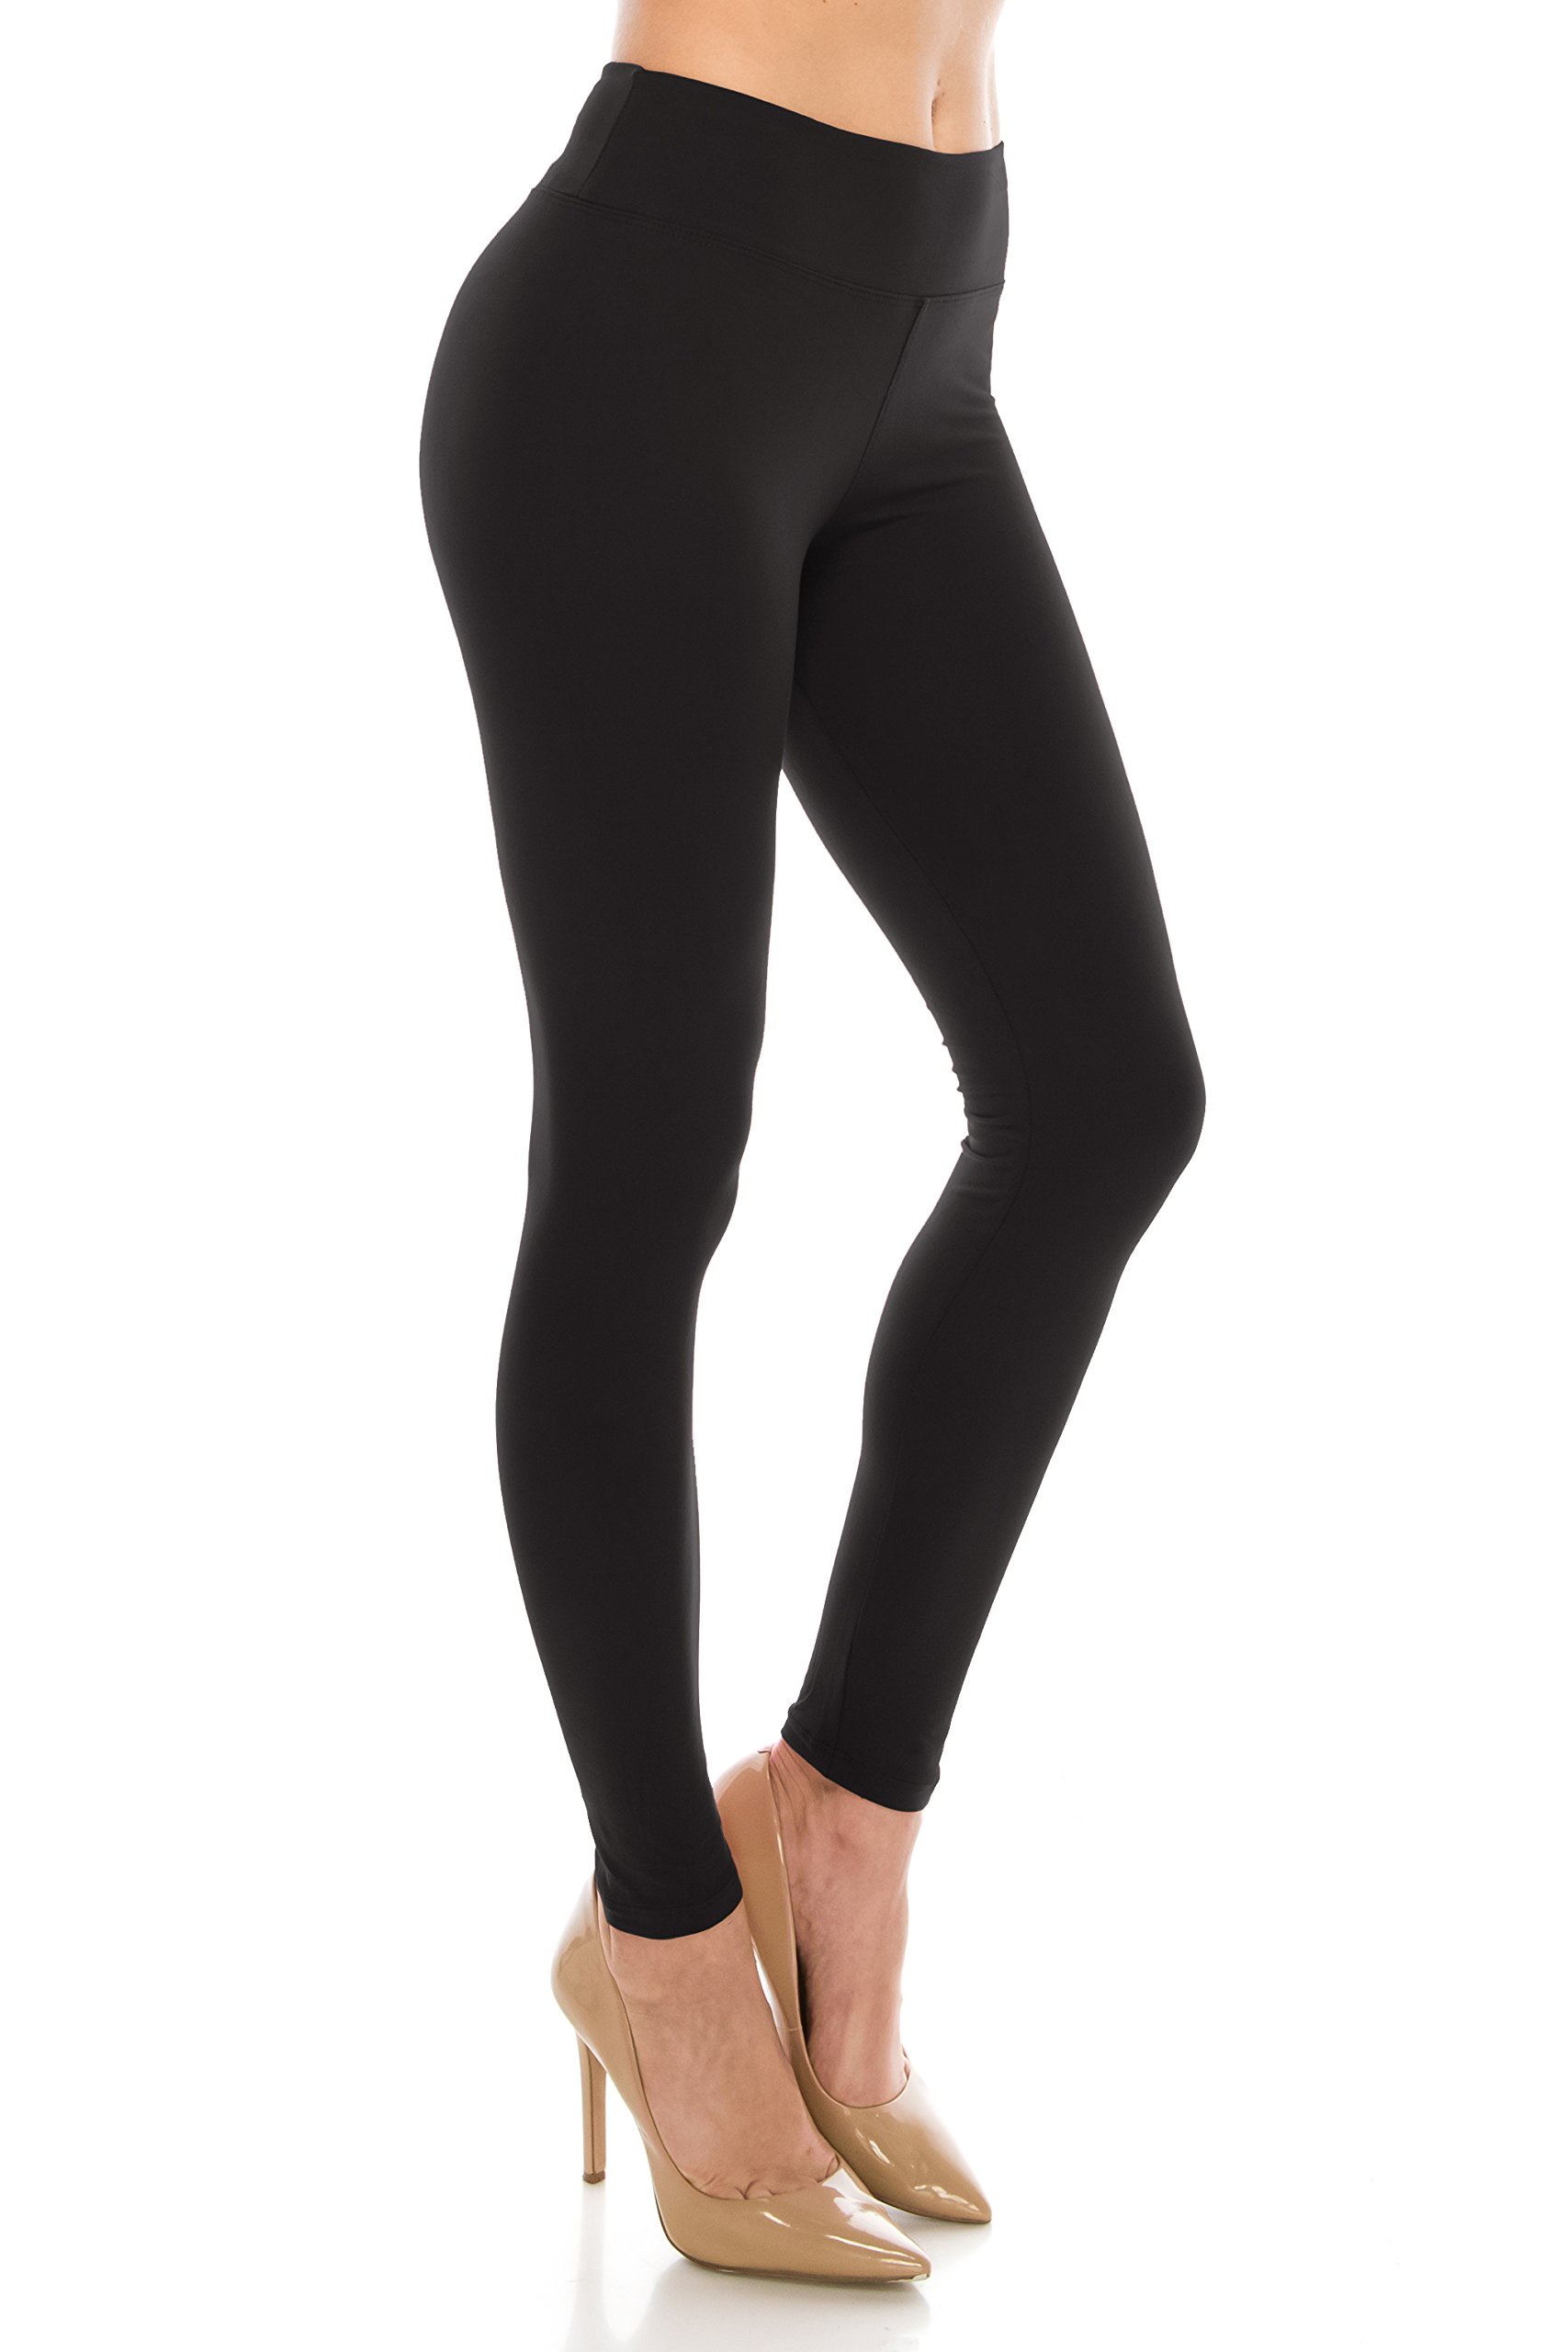 ALWAYS Leggings Women High Waist - Premium Buttery Soft Yoga Workout Stretch Solid Pants Black Plus